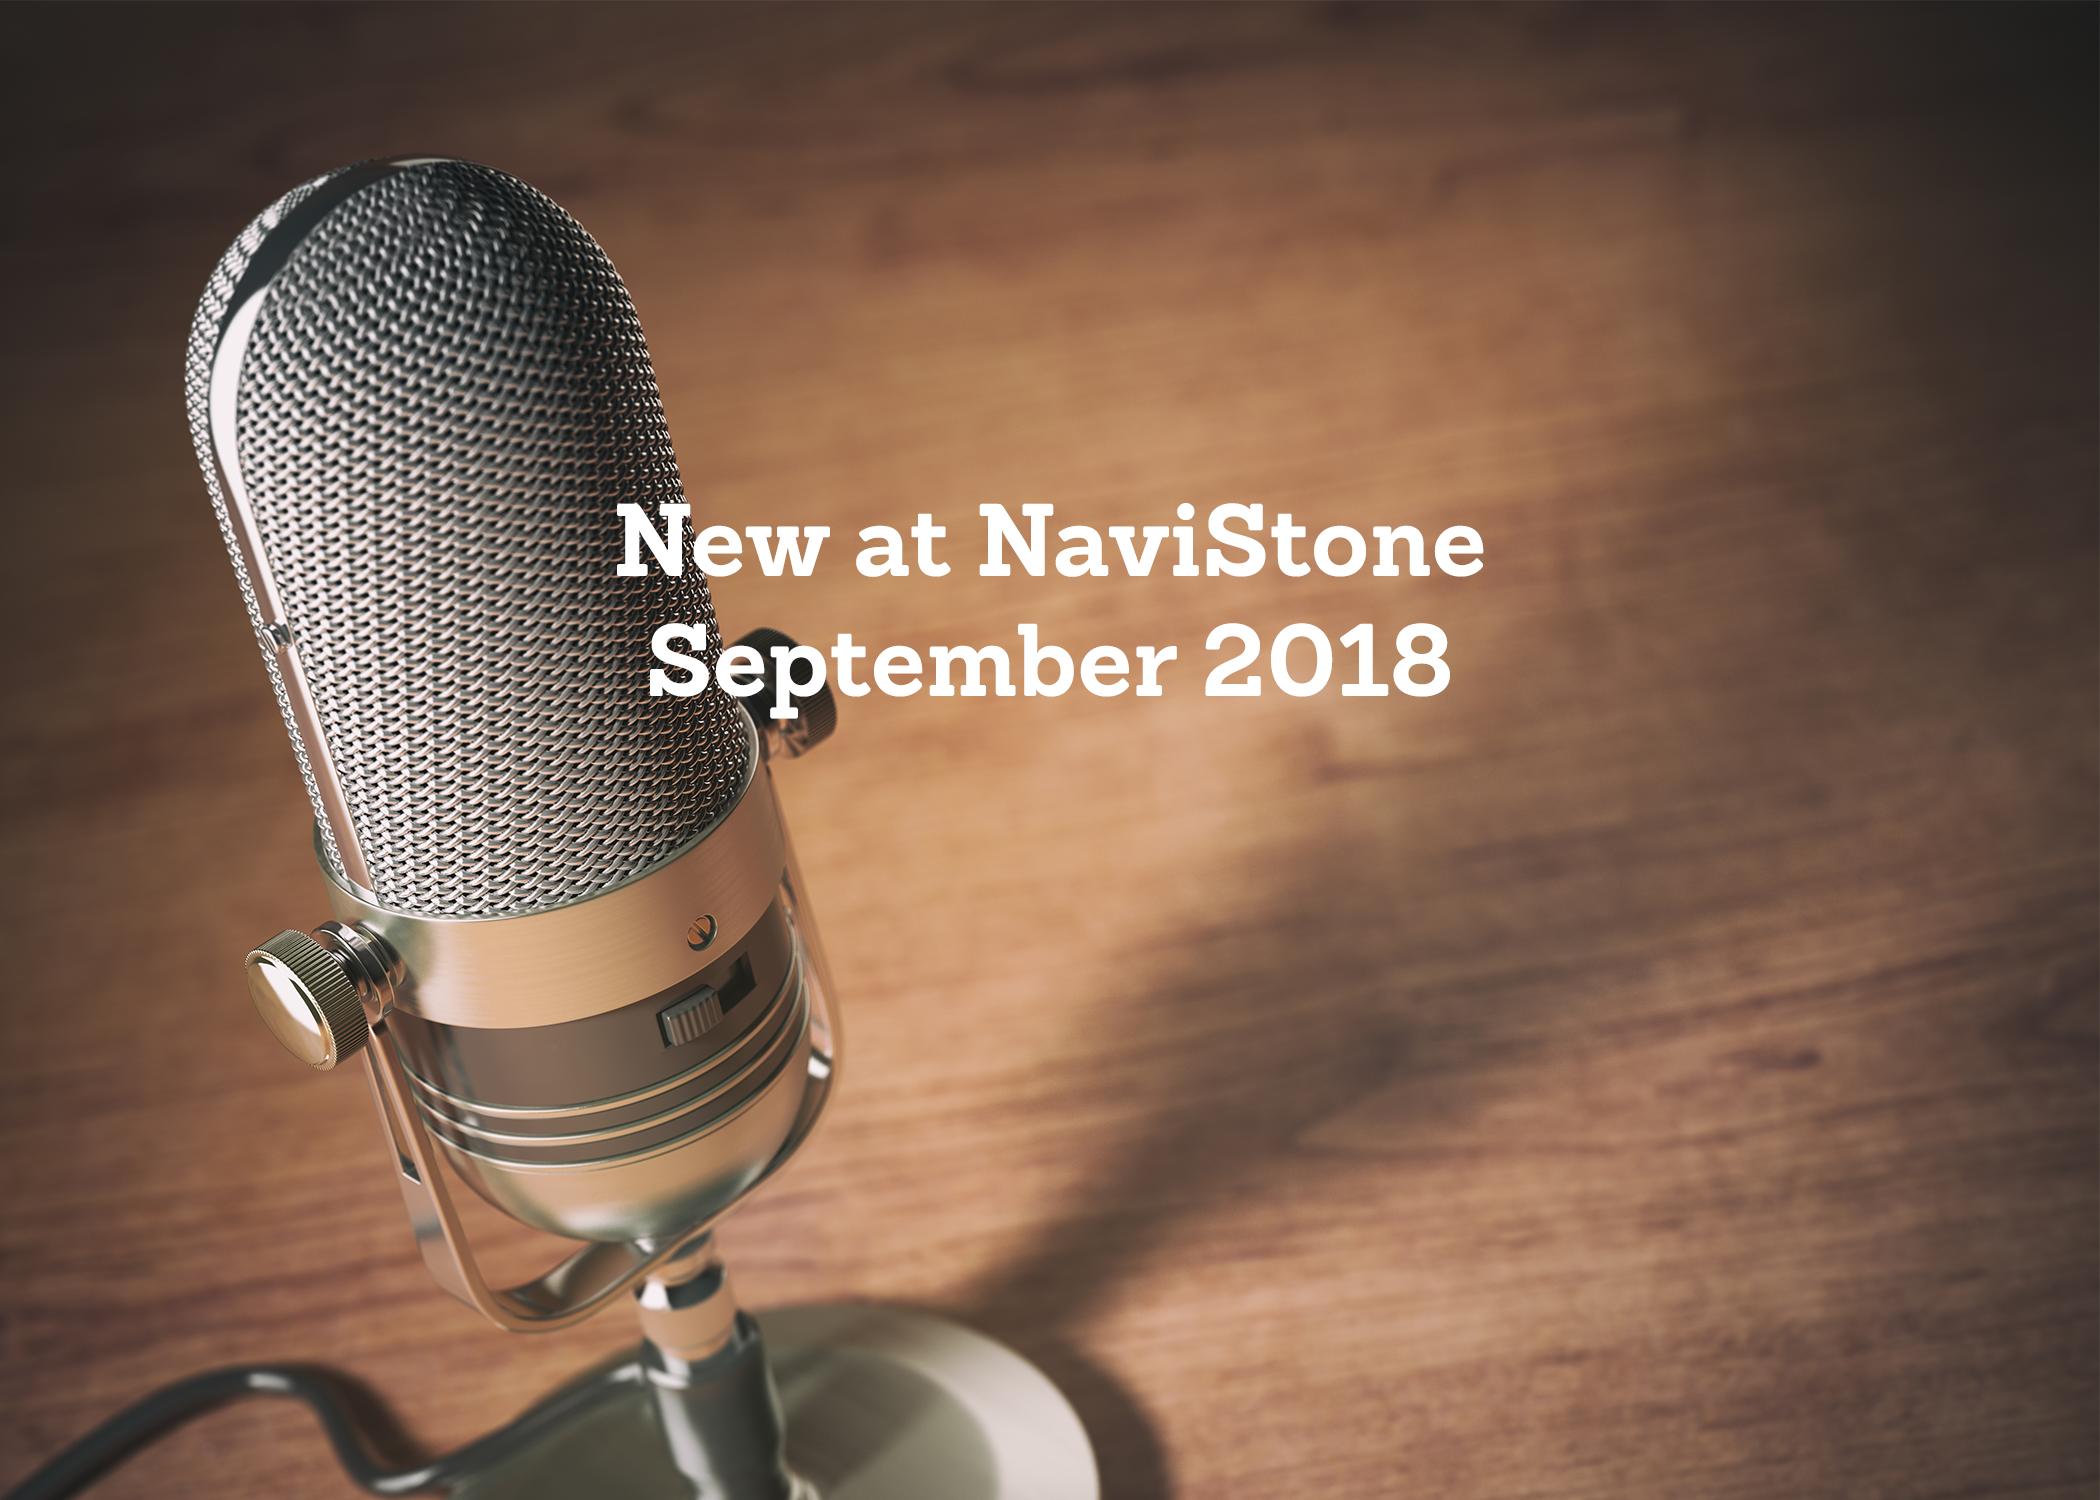 New at NaviStone September